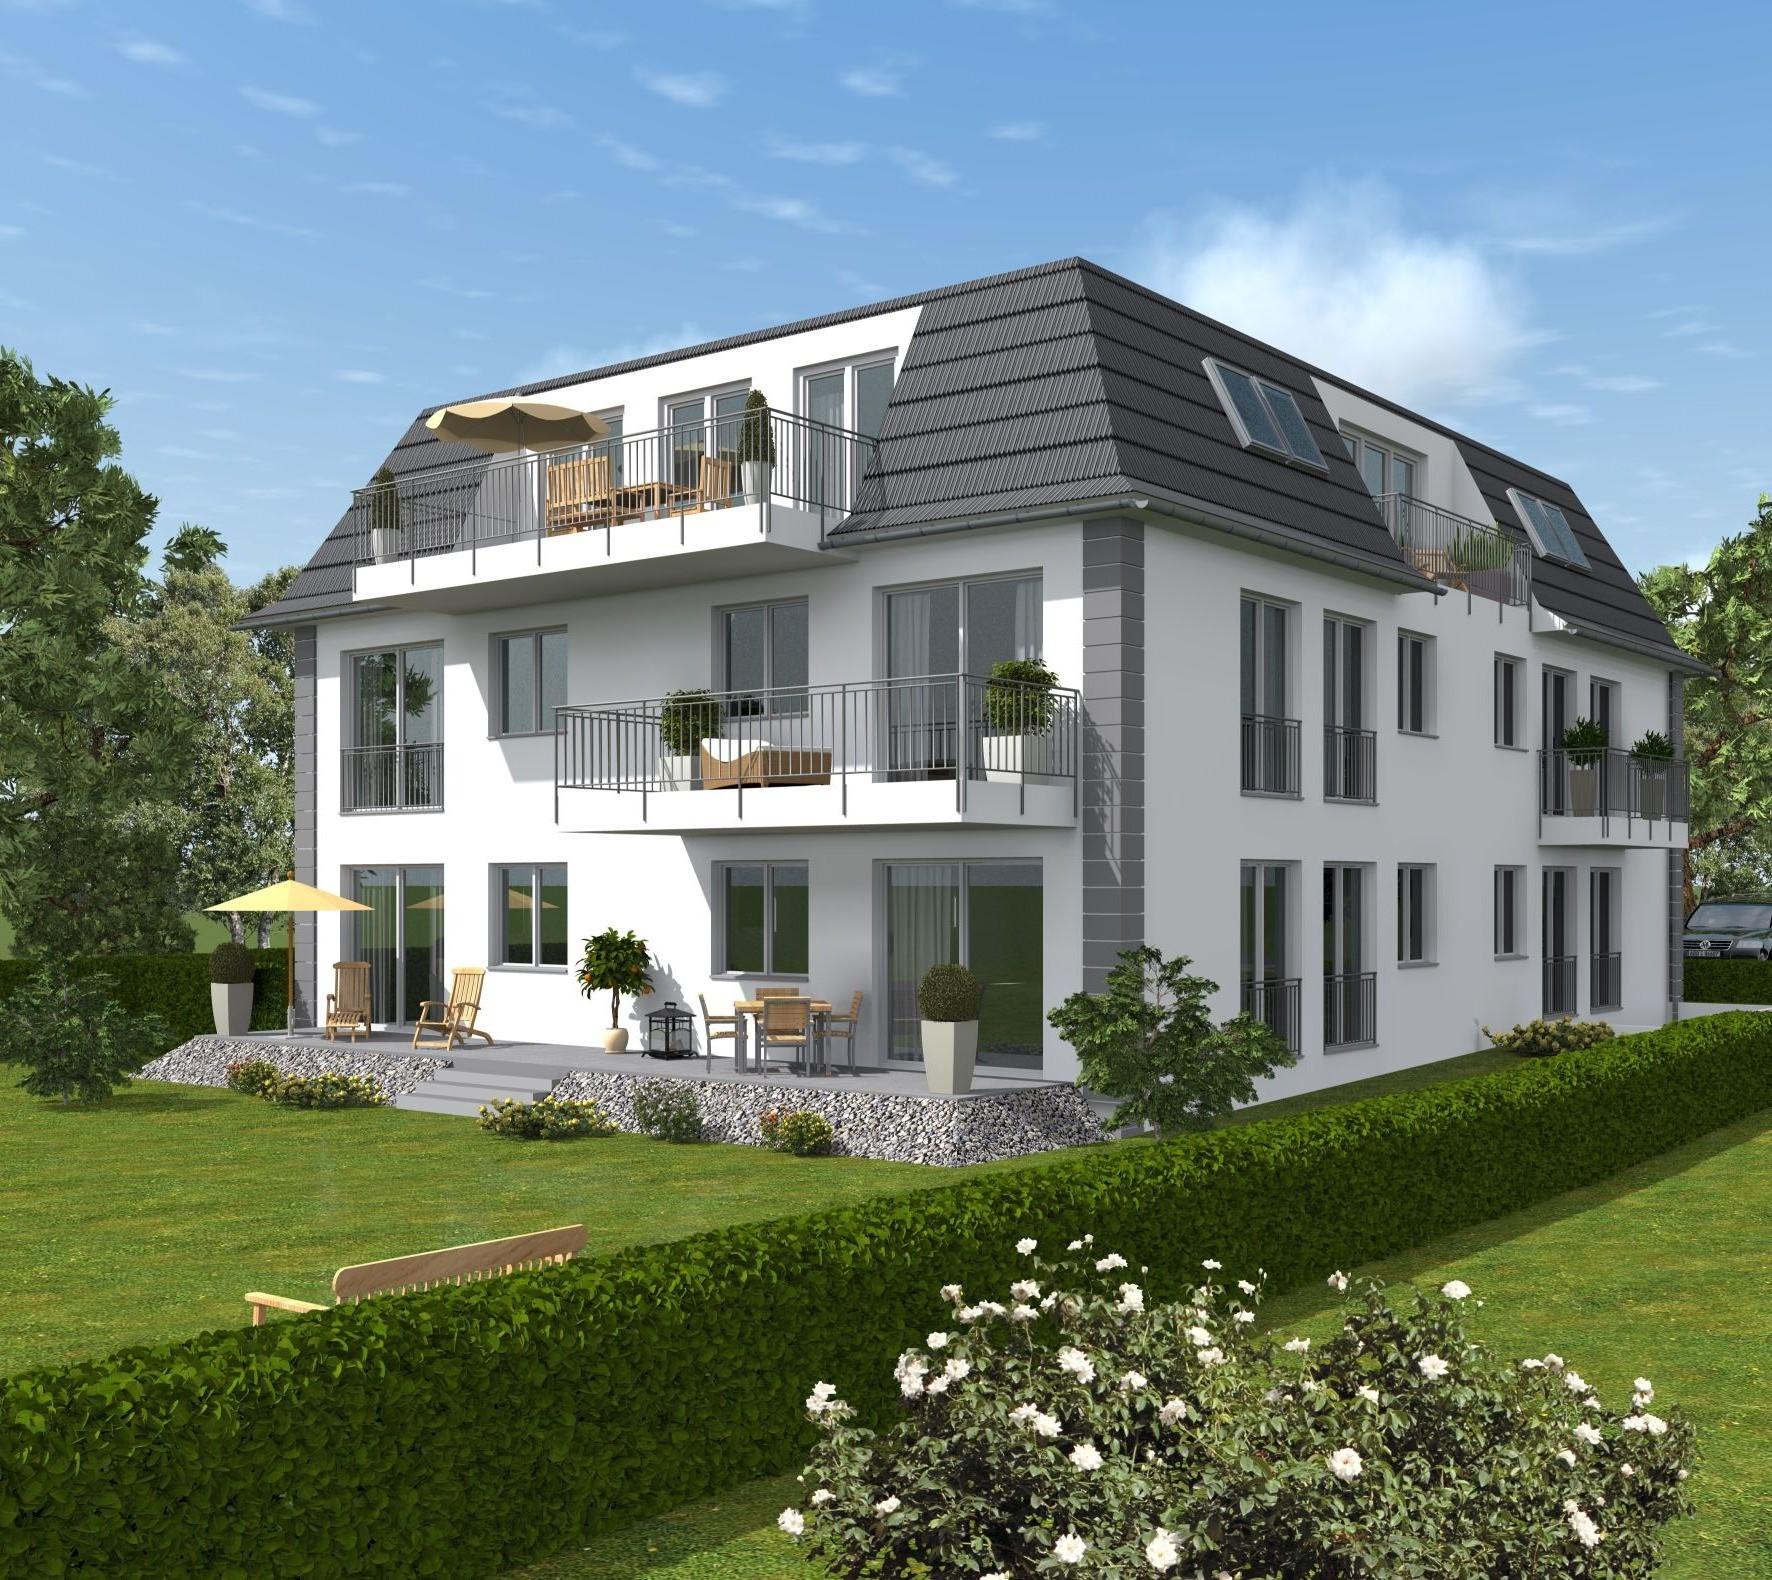 Haus-t-raum Immobilien